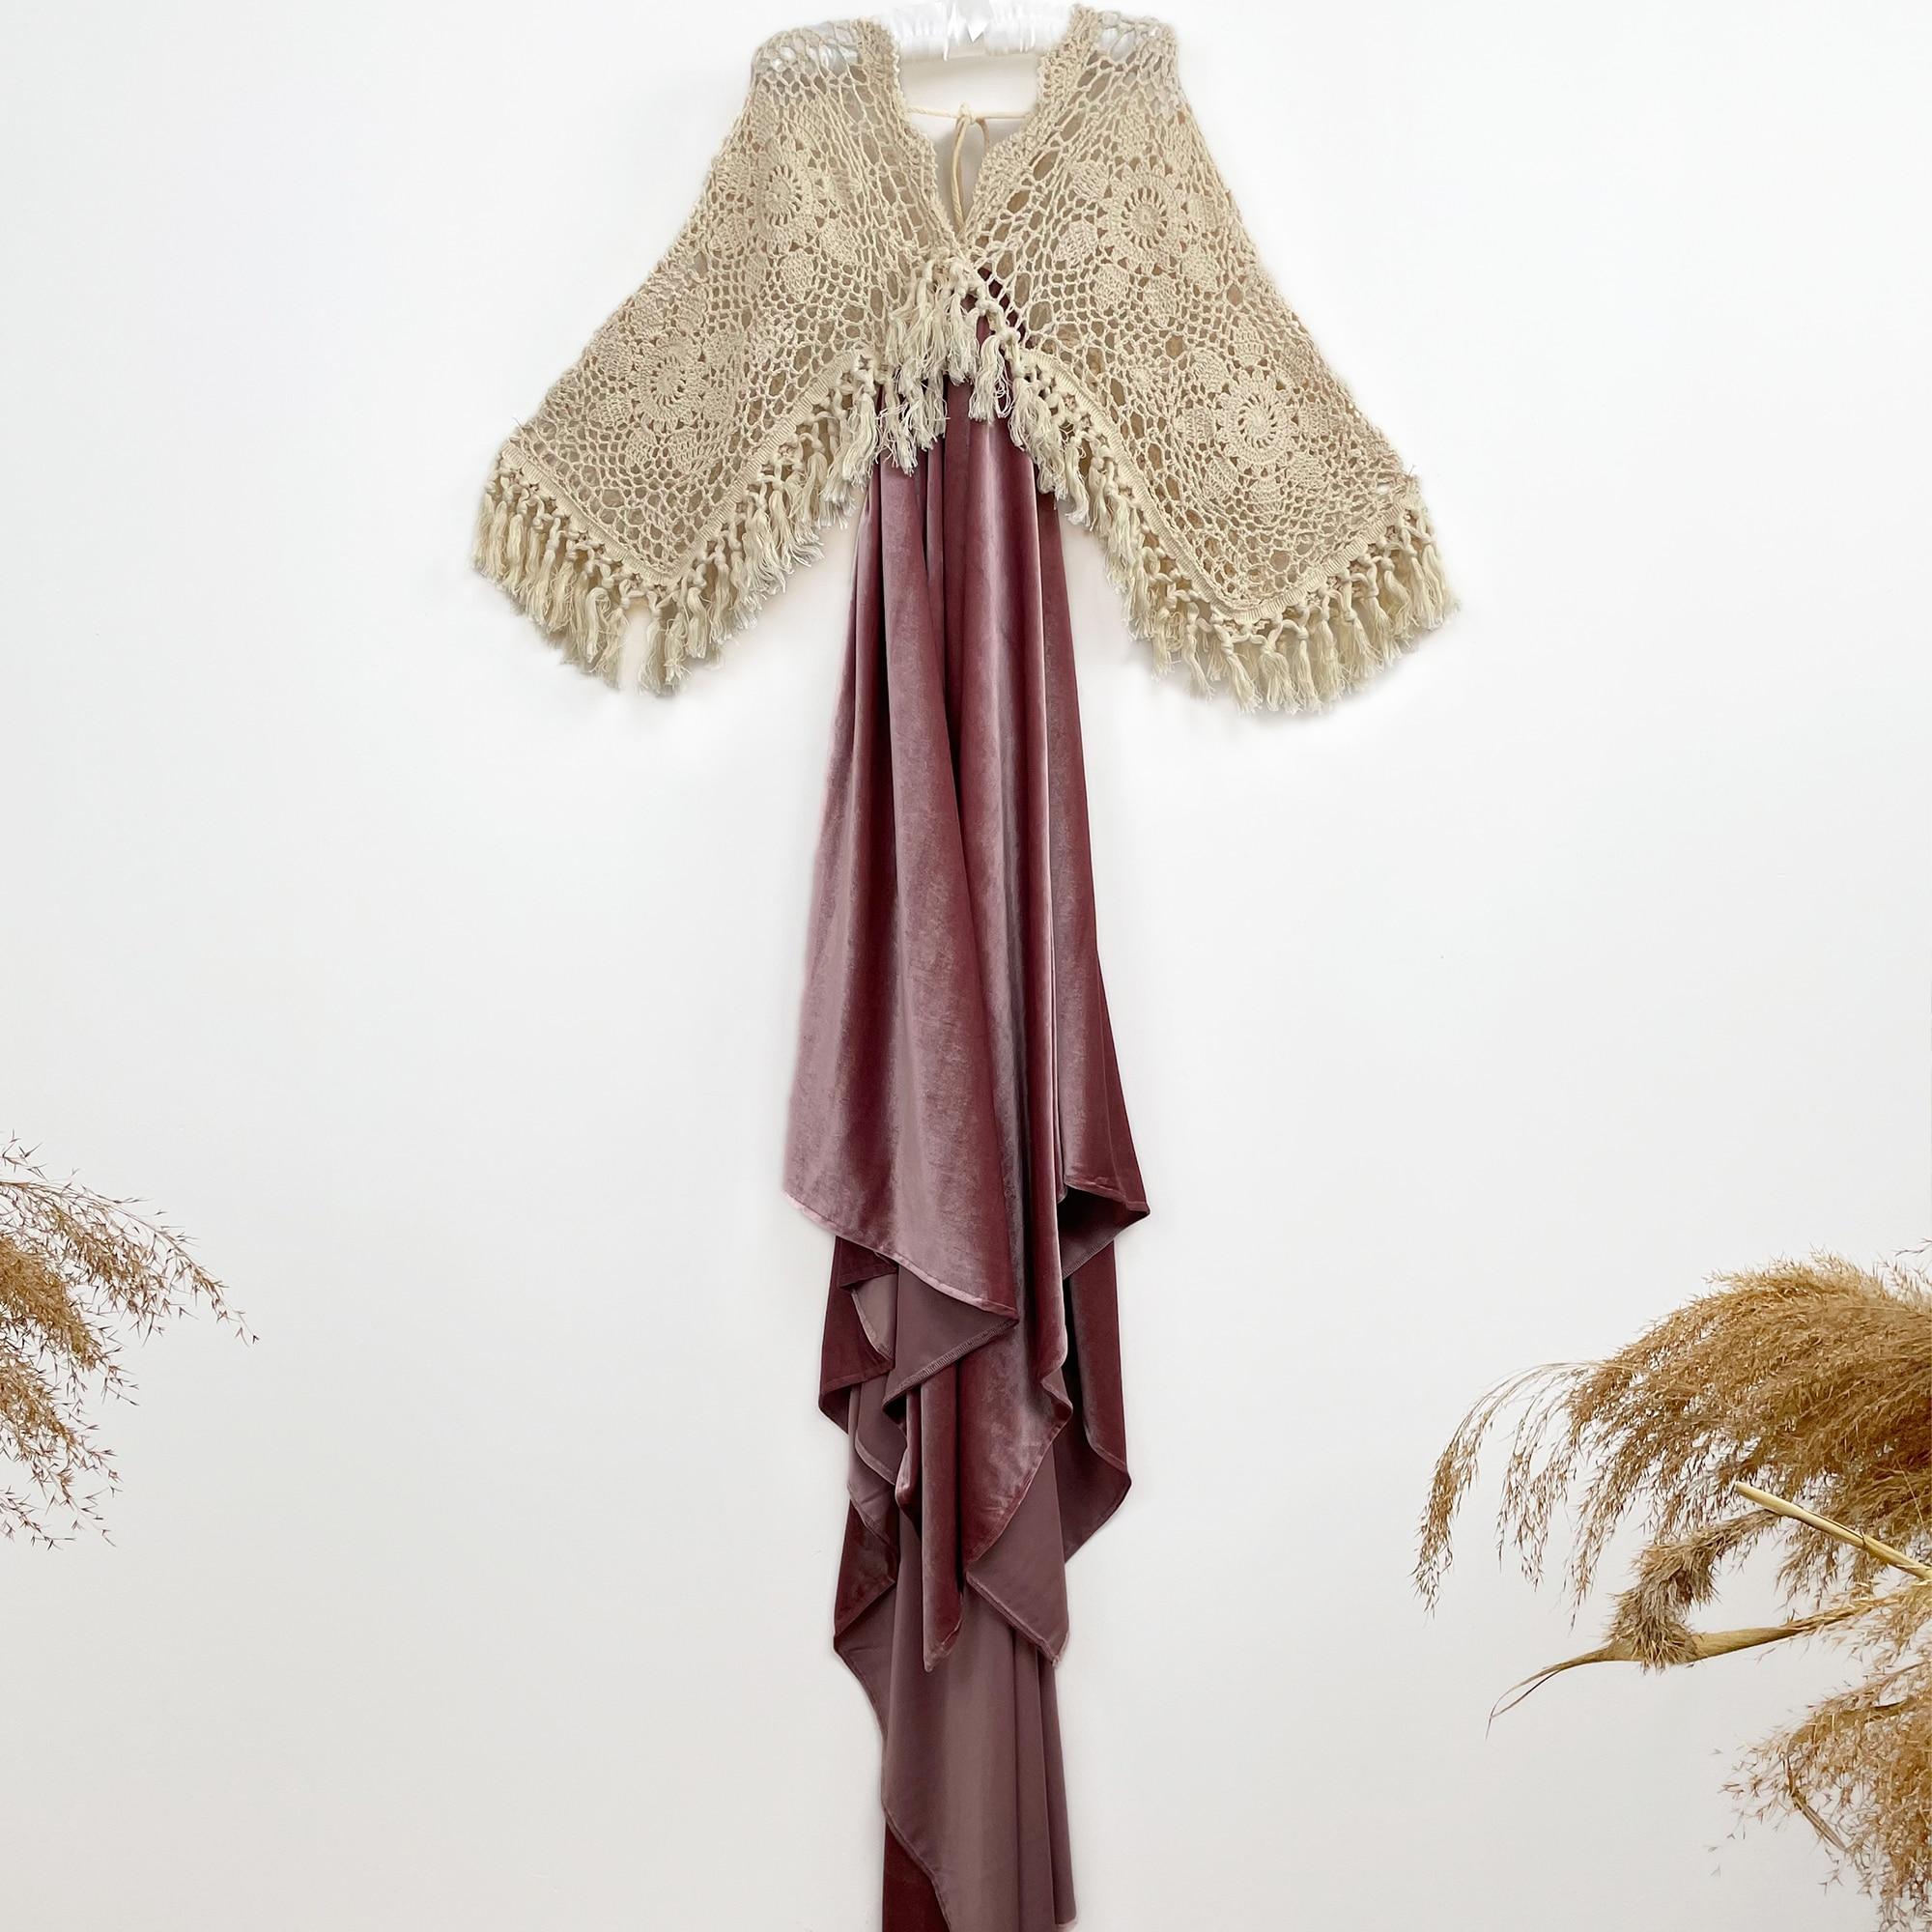 Photo Shoot Boho Crochet Cotton Long Bell Sleeves 4-8 Years Little Girl Dress Child Velvet Gown for Kid Photography Accessories